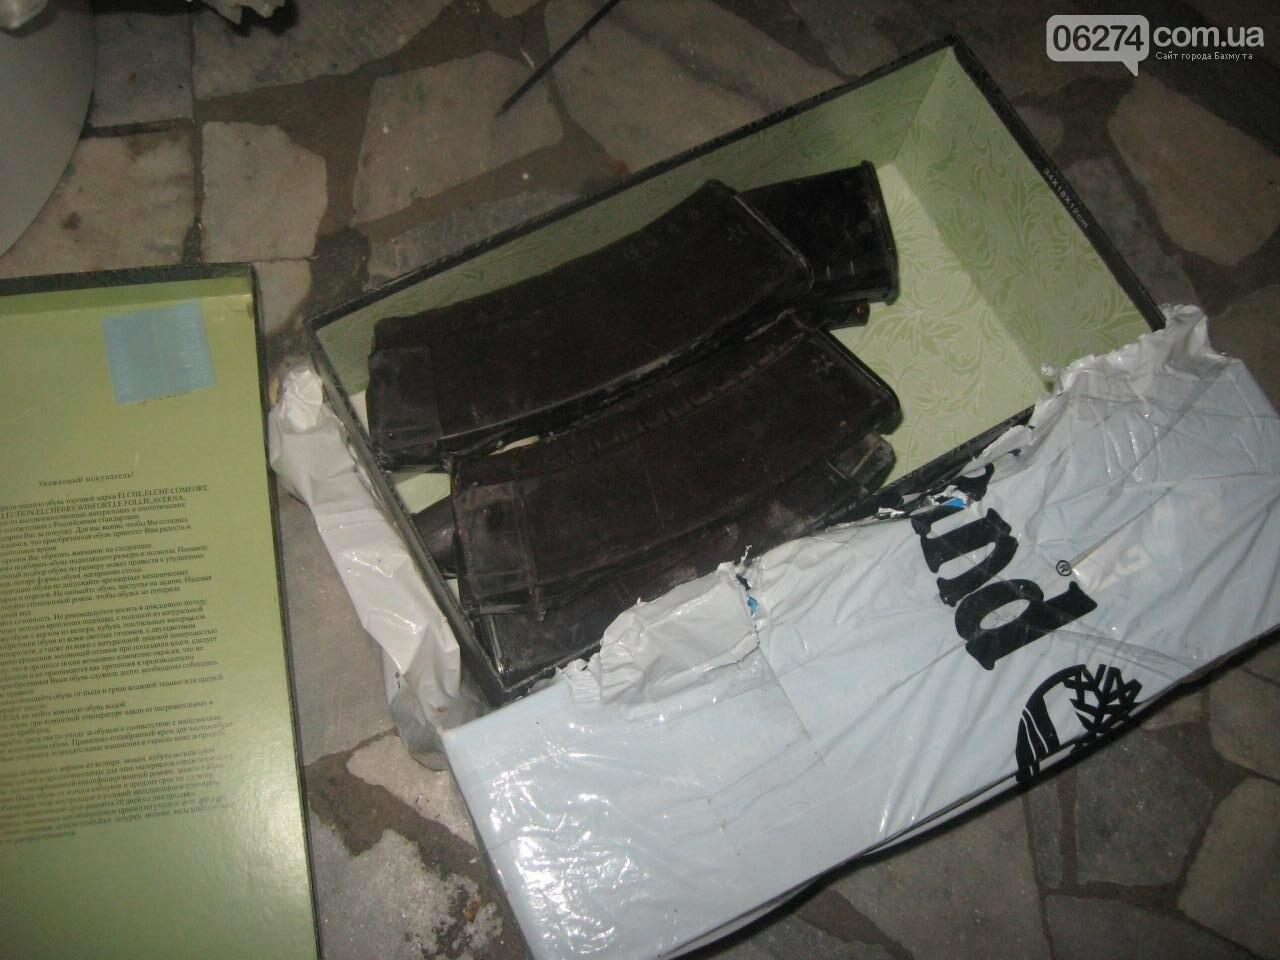 В одной из квартир города бахмутчанин прятал арсенал боеприпасов, фото-1